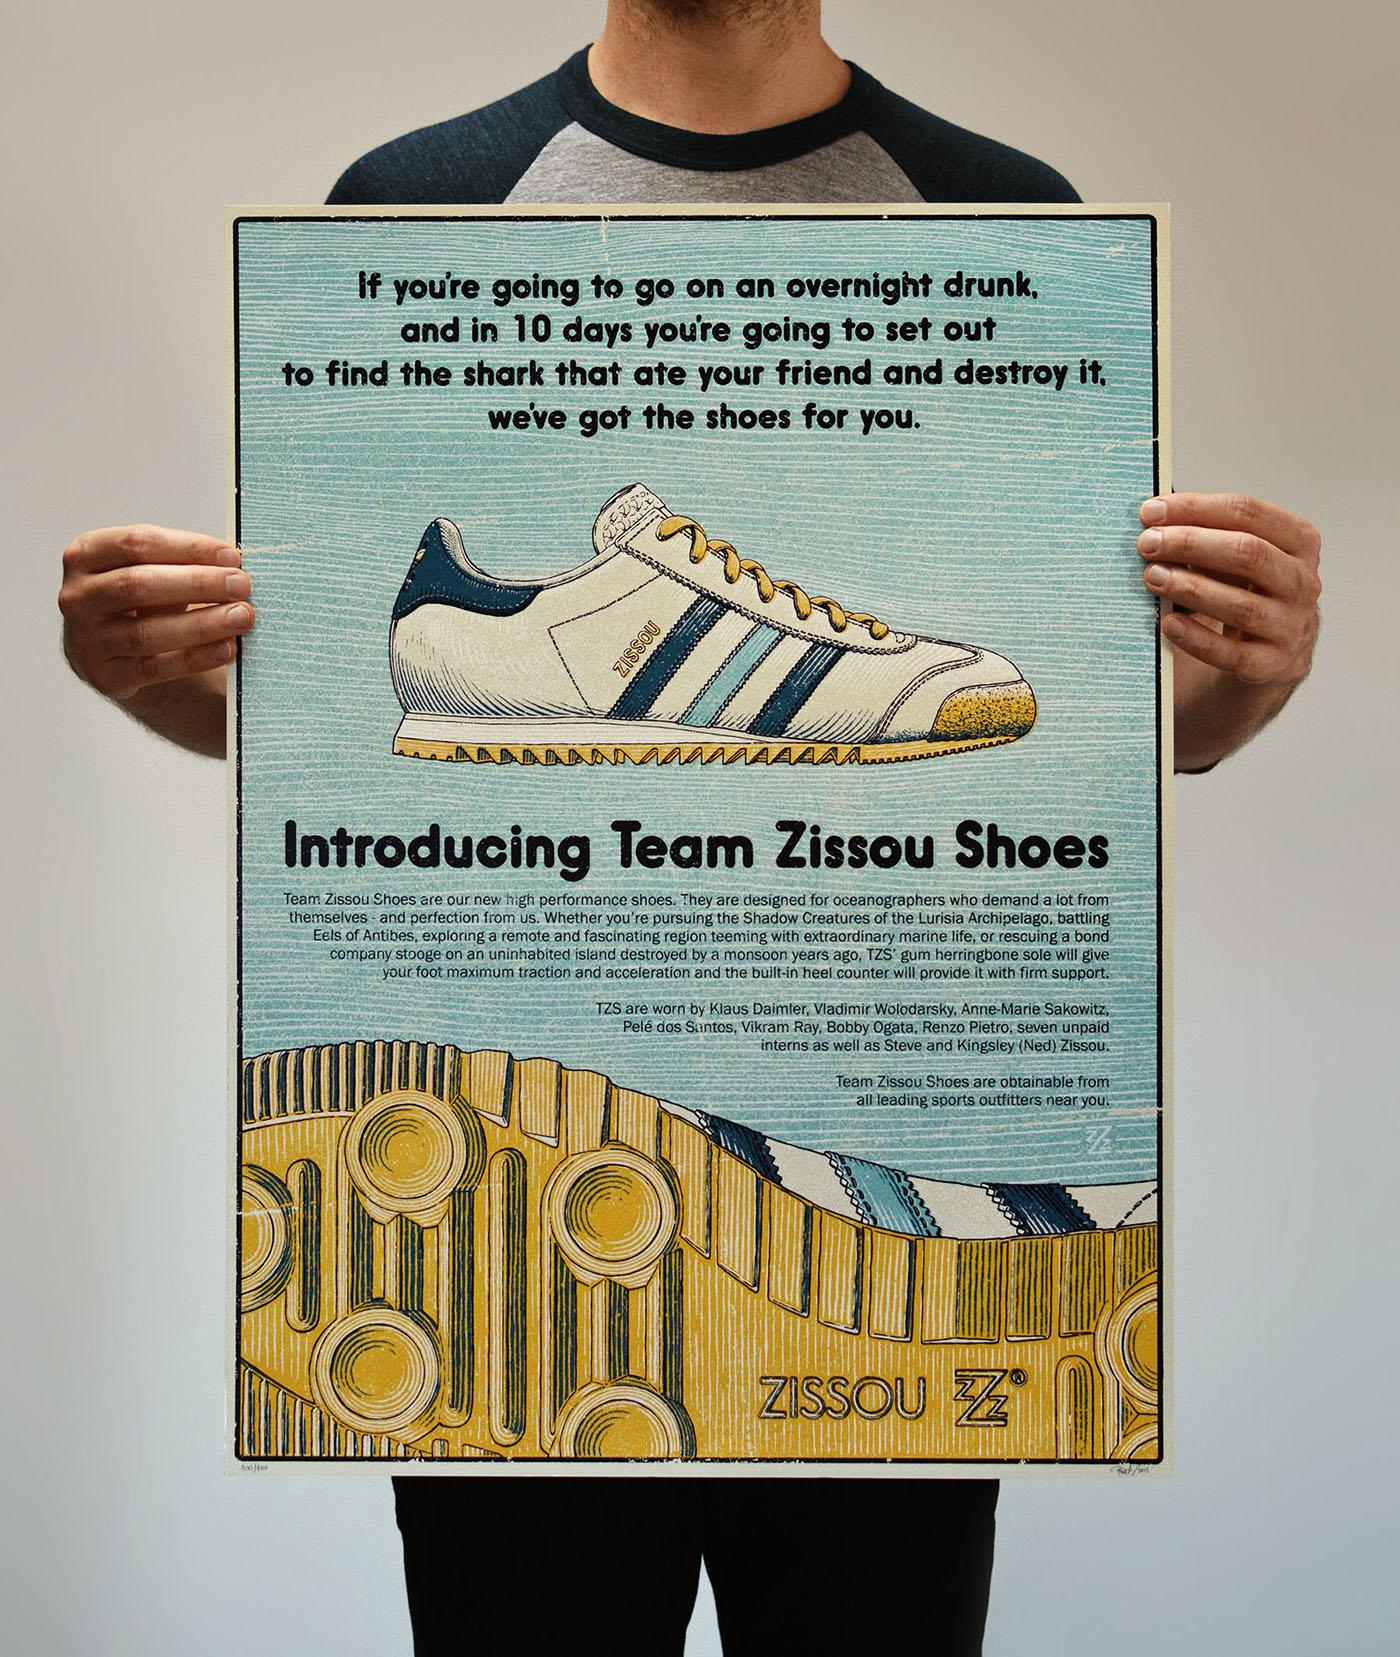 Adidas Team Zissou Shoes - Life Aquatic on Behance 2c524d353